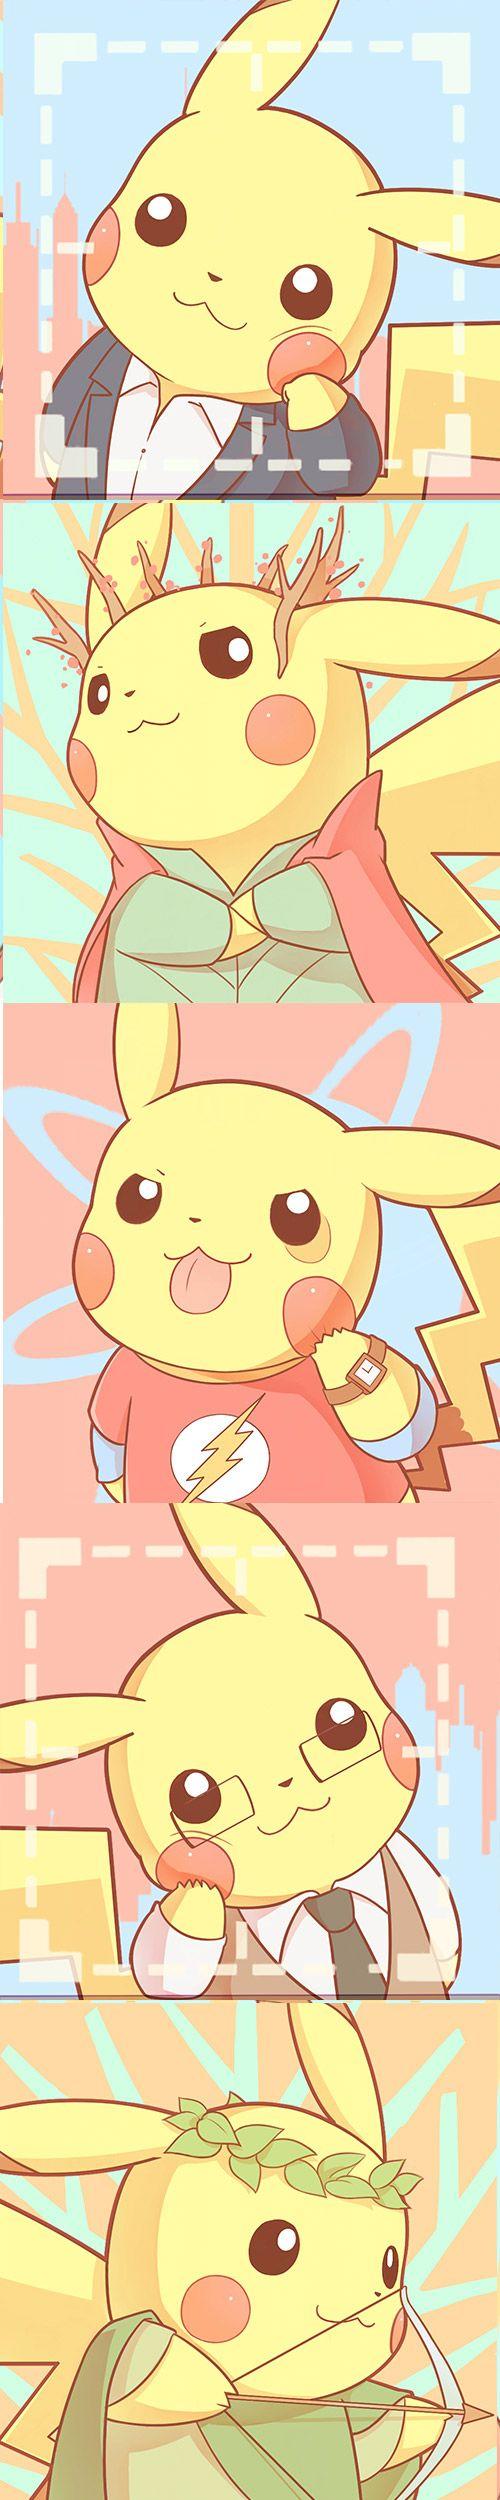 Pikachu con disfraces